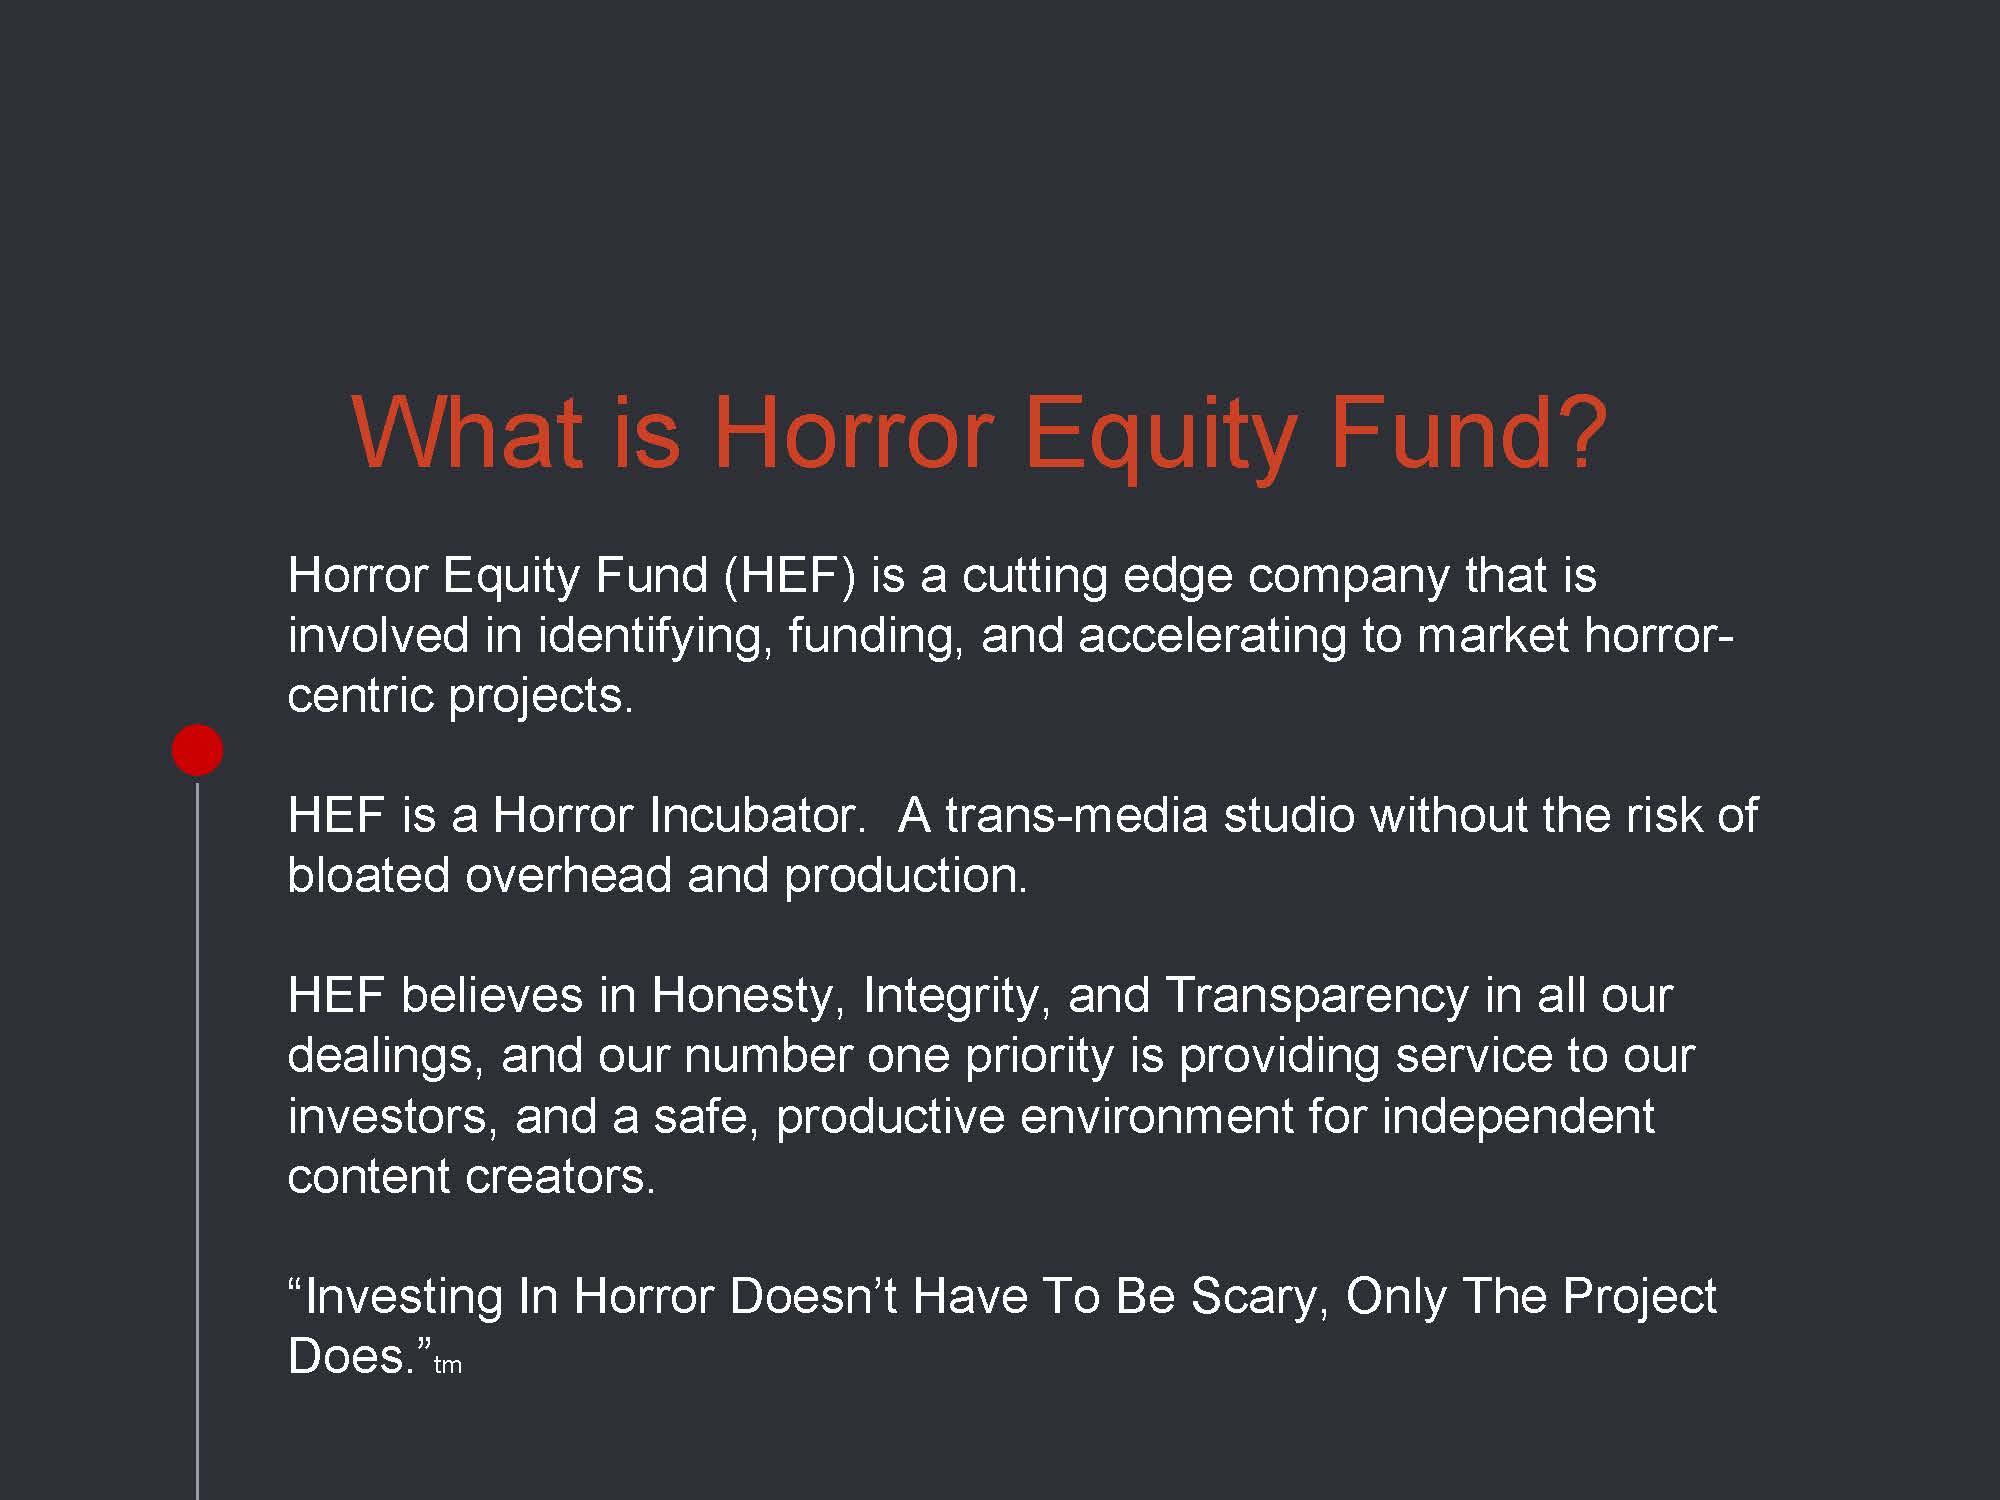 REVISED V20 -HorrorEquityFund 1 Min Sponsor Pitch Deck FINAL JPG 2017_Page_23.jpg